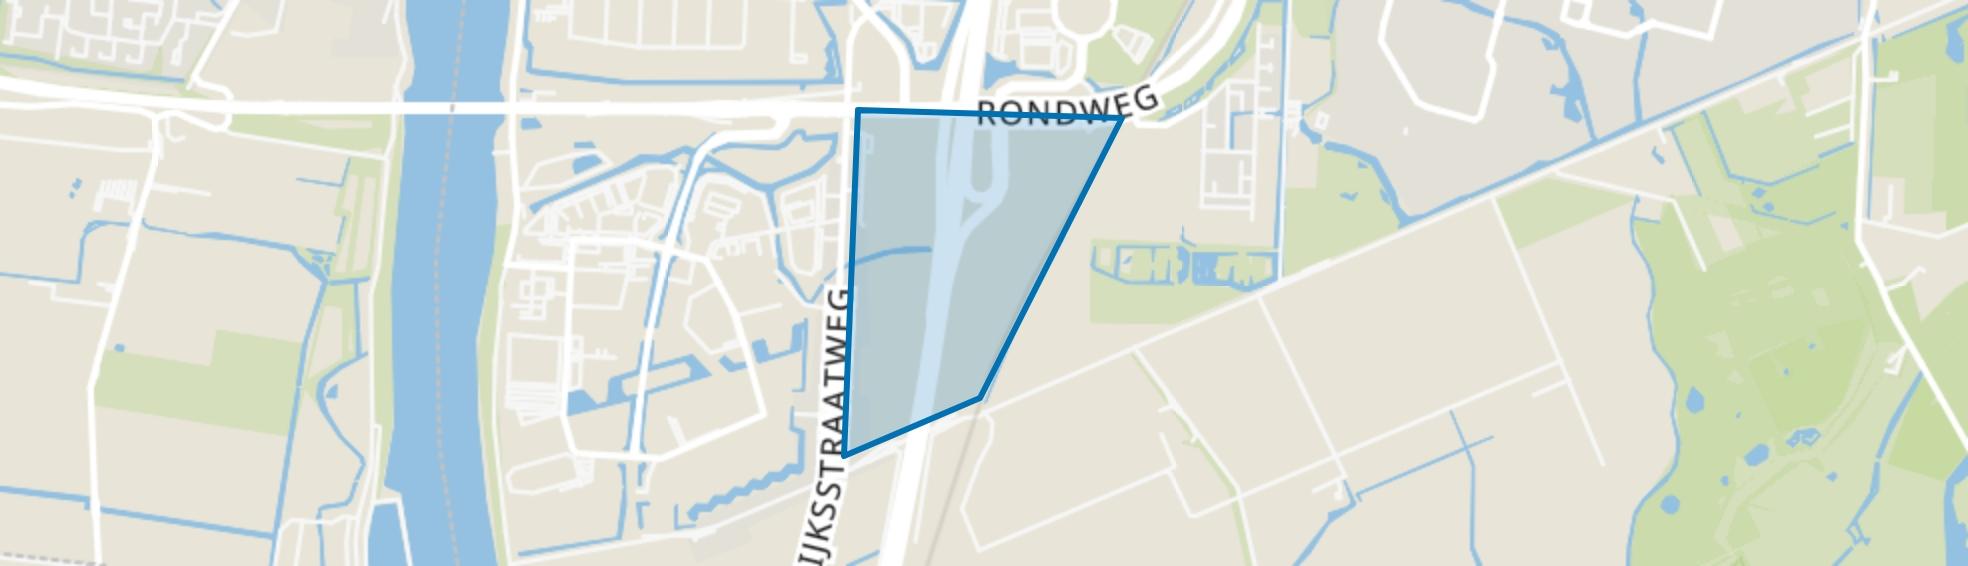 Oostkil, Dordrecht map